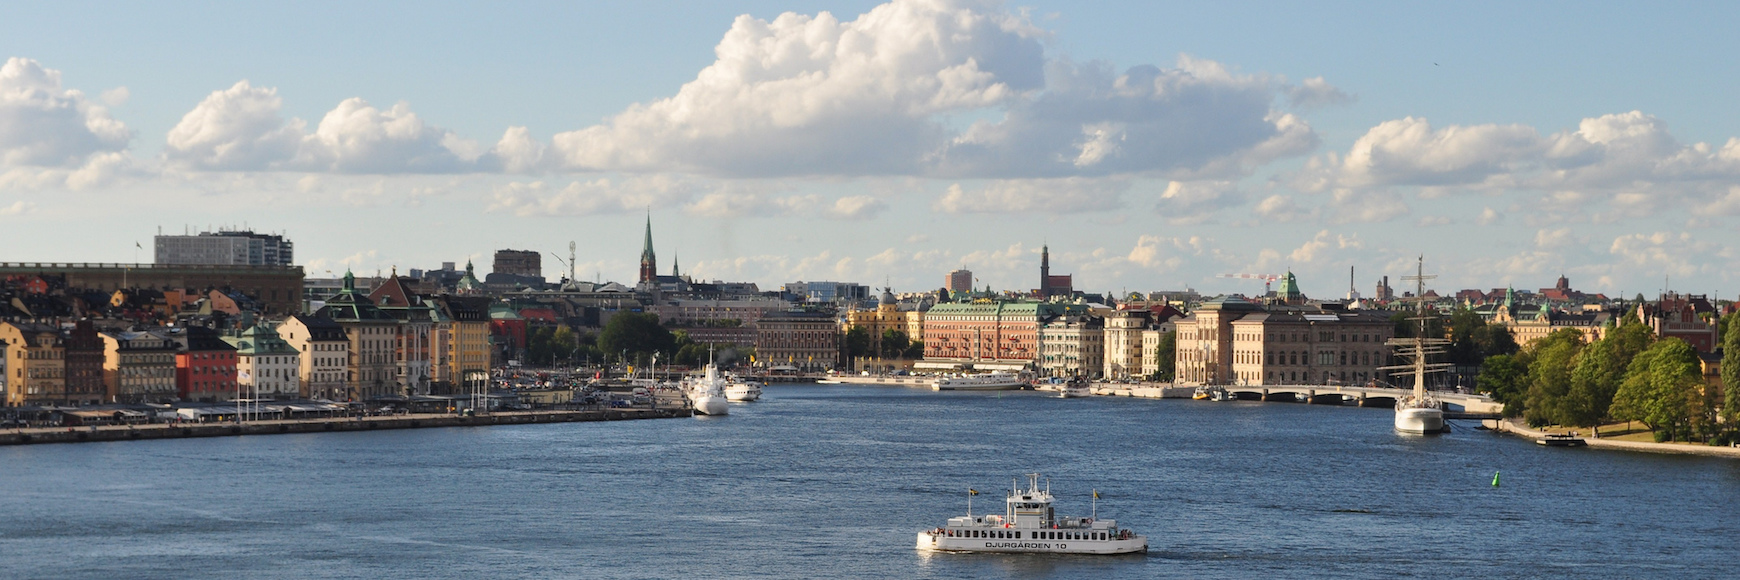 noleggio barca a motore Svezia